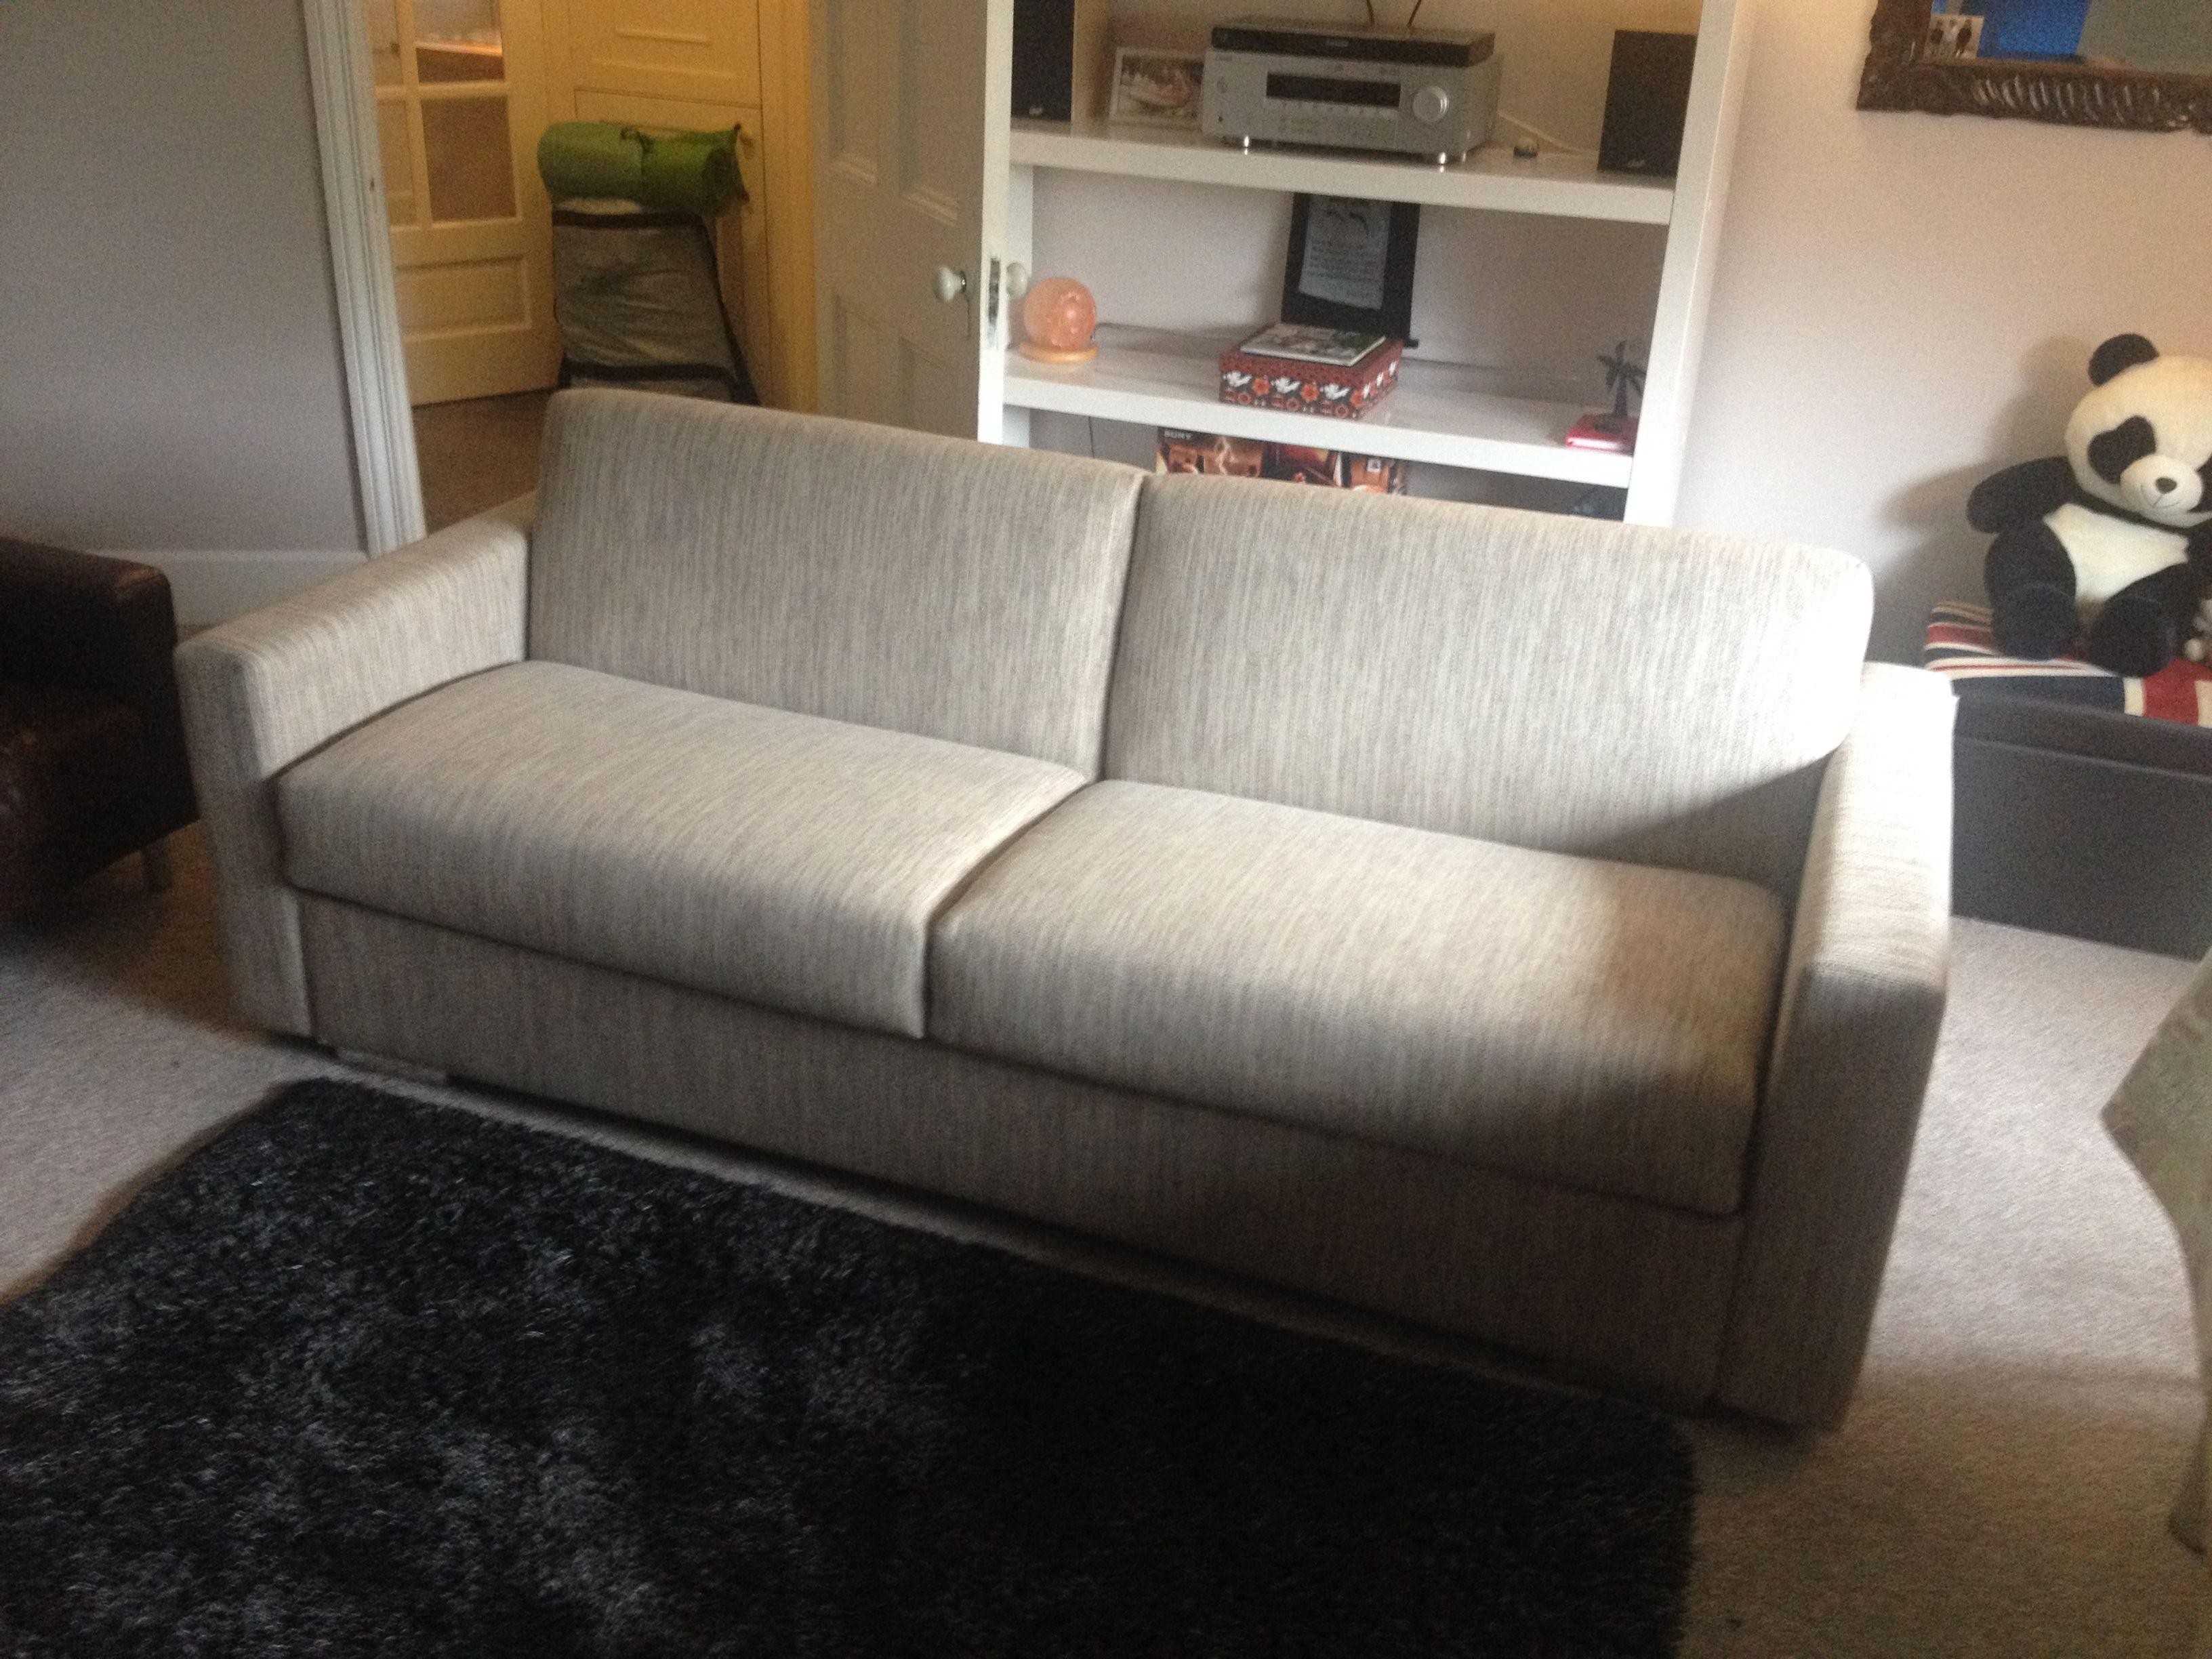 Sensational Lario 160 Cm X 200 Cm Pocket Sprung Mattress Sofa Bed With Short Links Chair Design For Home Short Linksinfo